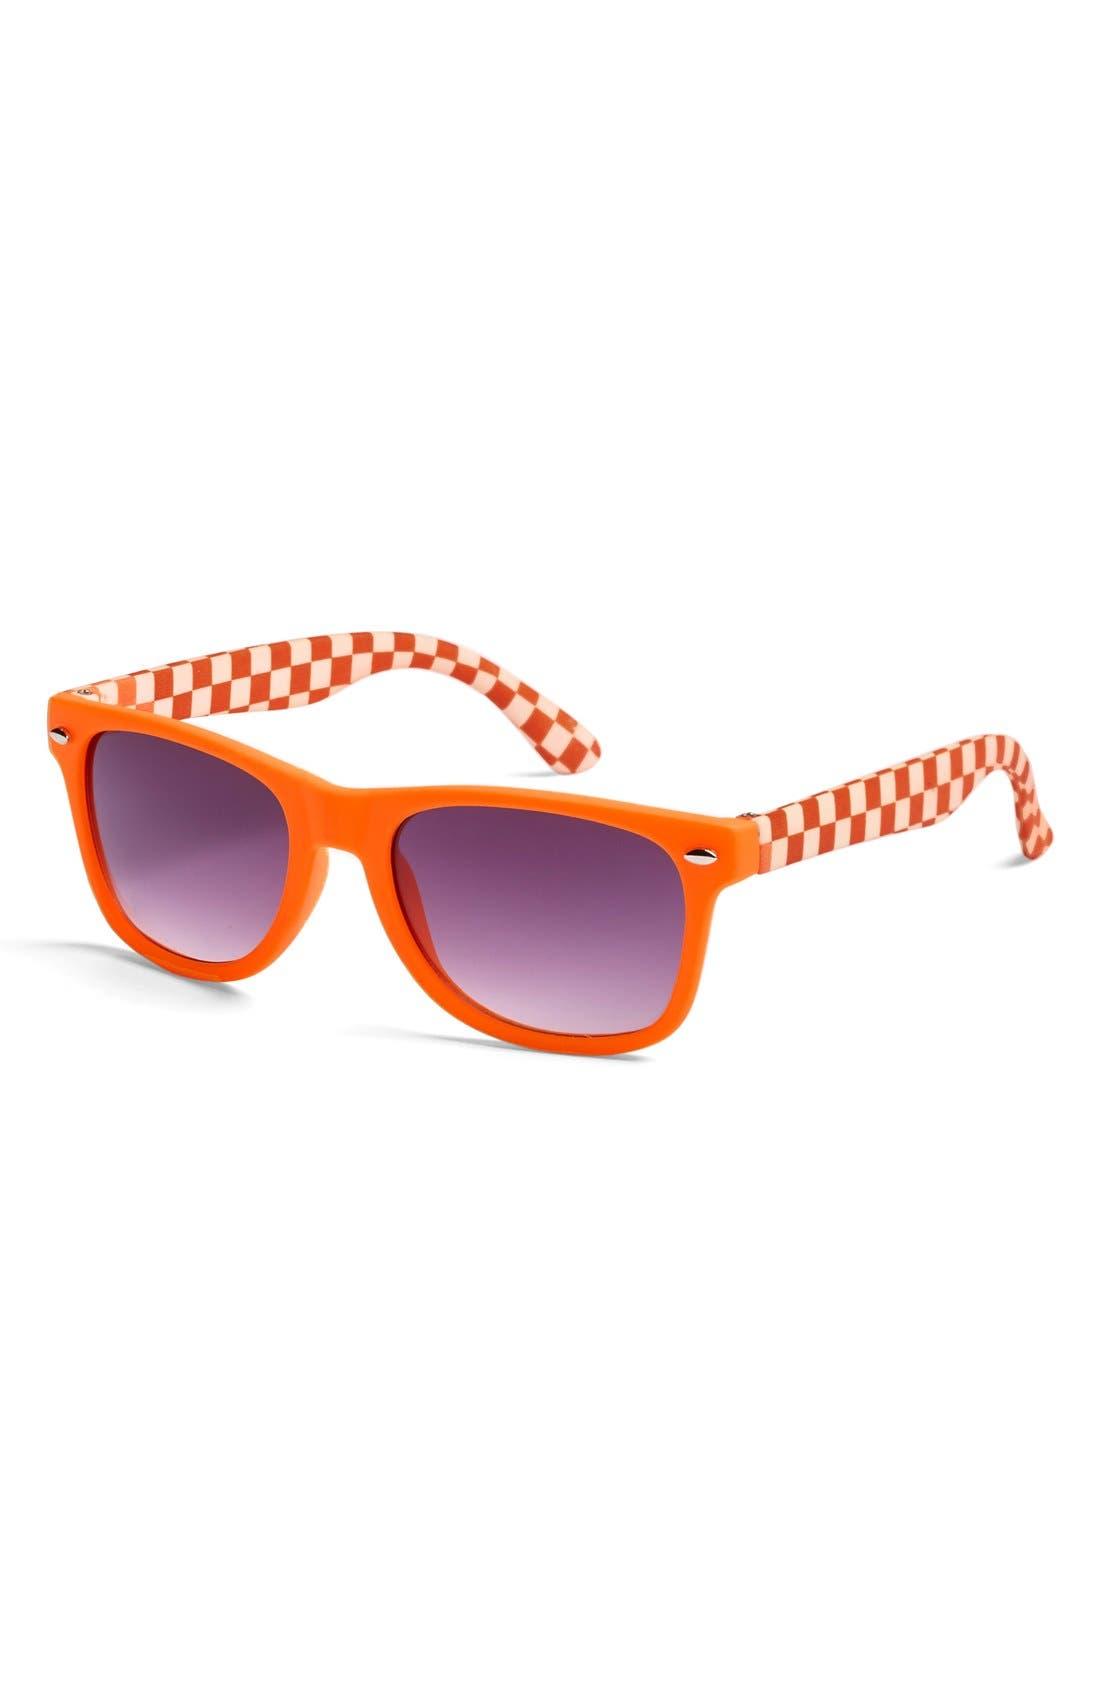 Main Image - Loose Leaf Eyewear Retro Sunglasses (Toddler Boys)